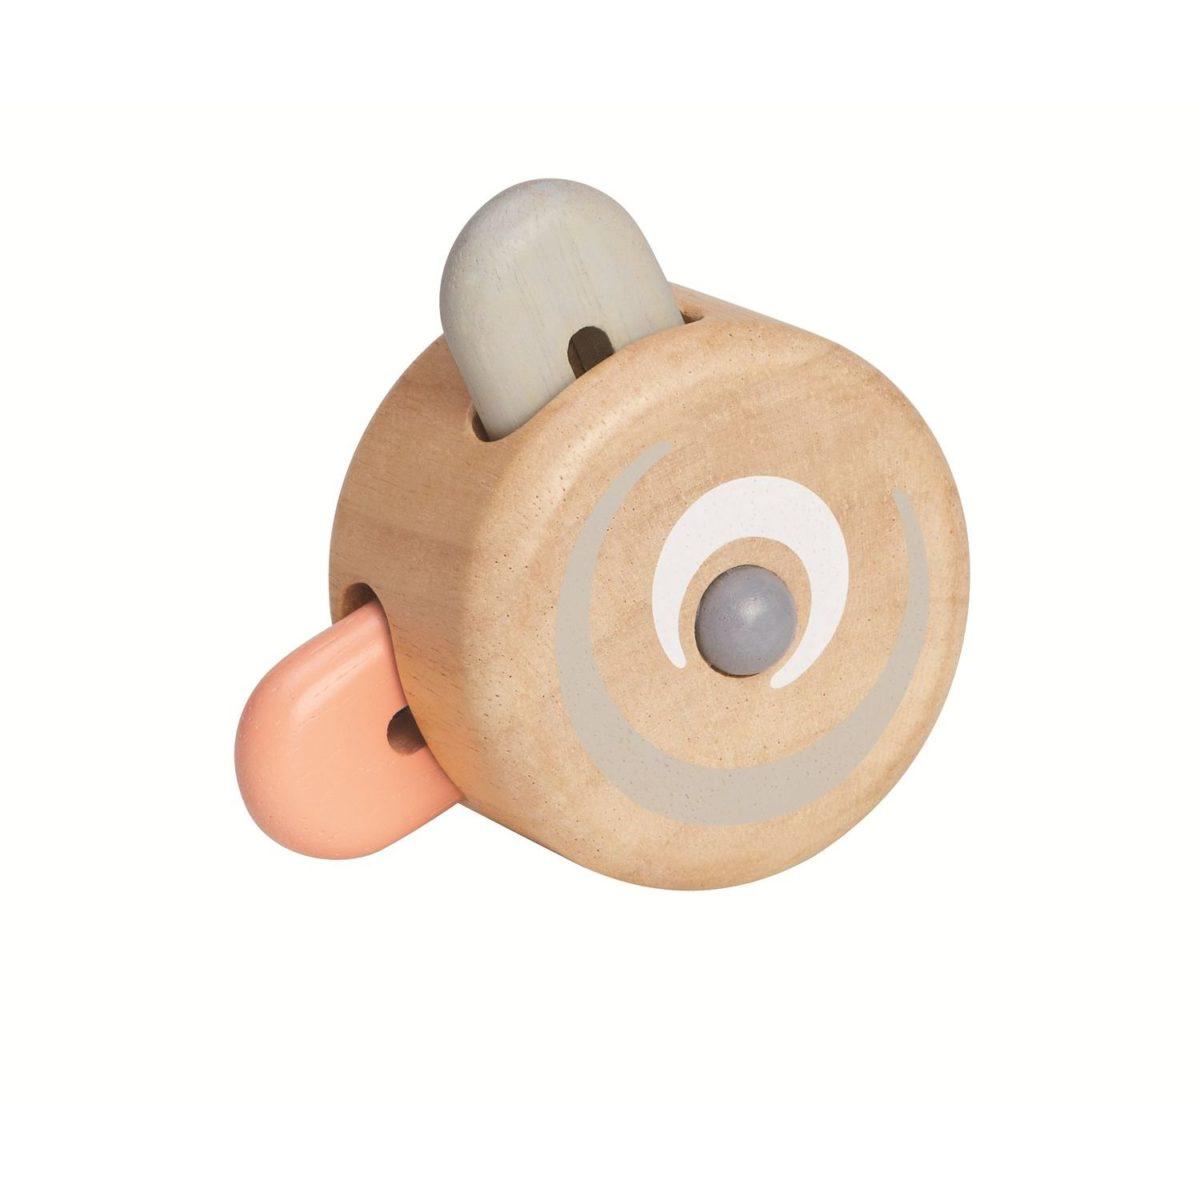 Krabbelspielzeug Kuck-Kuck